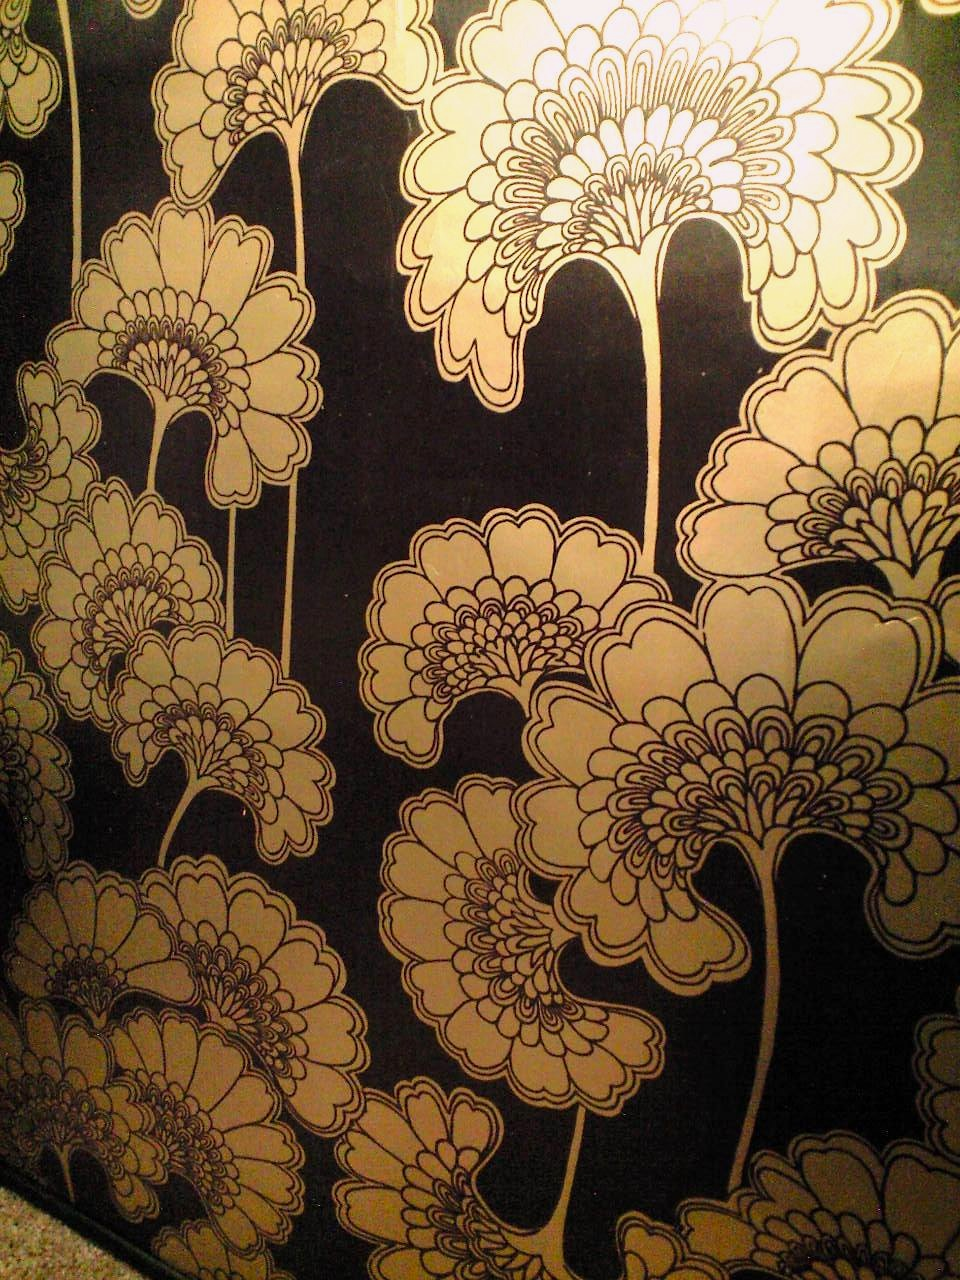 Florence Broadhurst フローレント・ブロードハーストの壁紙 その2_c0157866_18125577.jpg